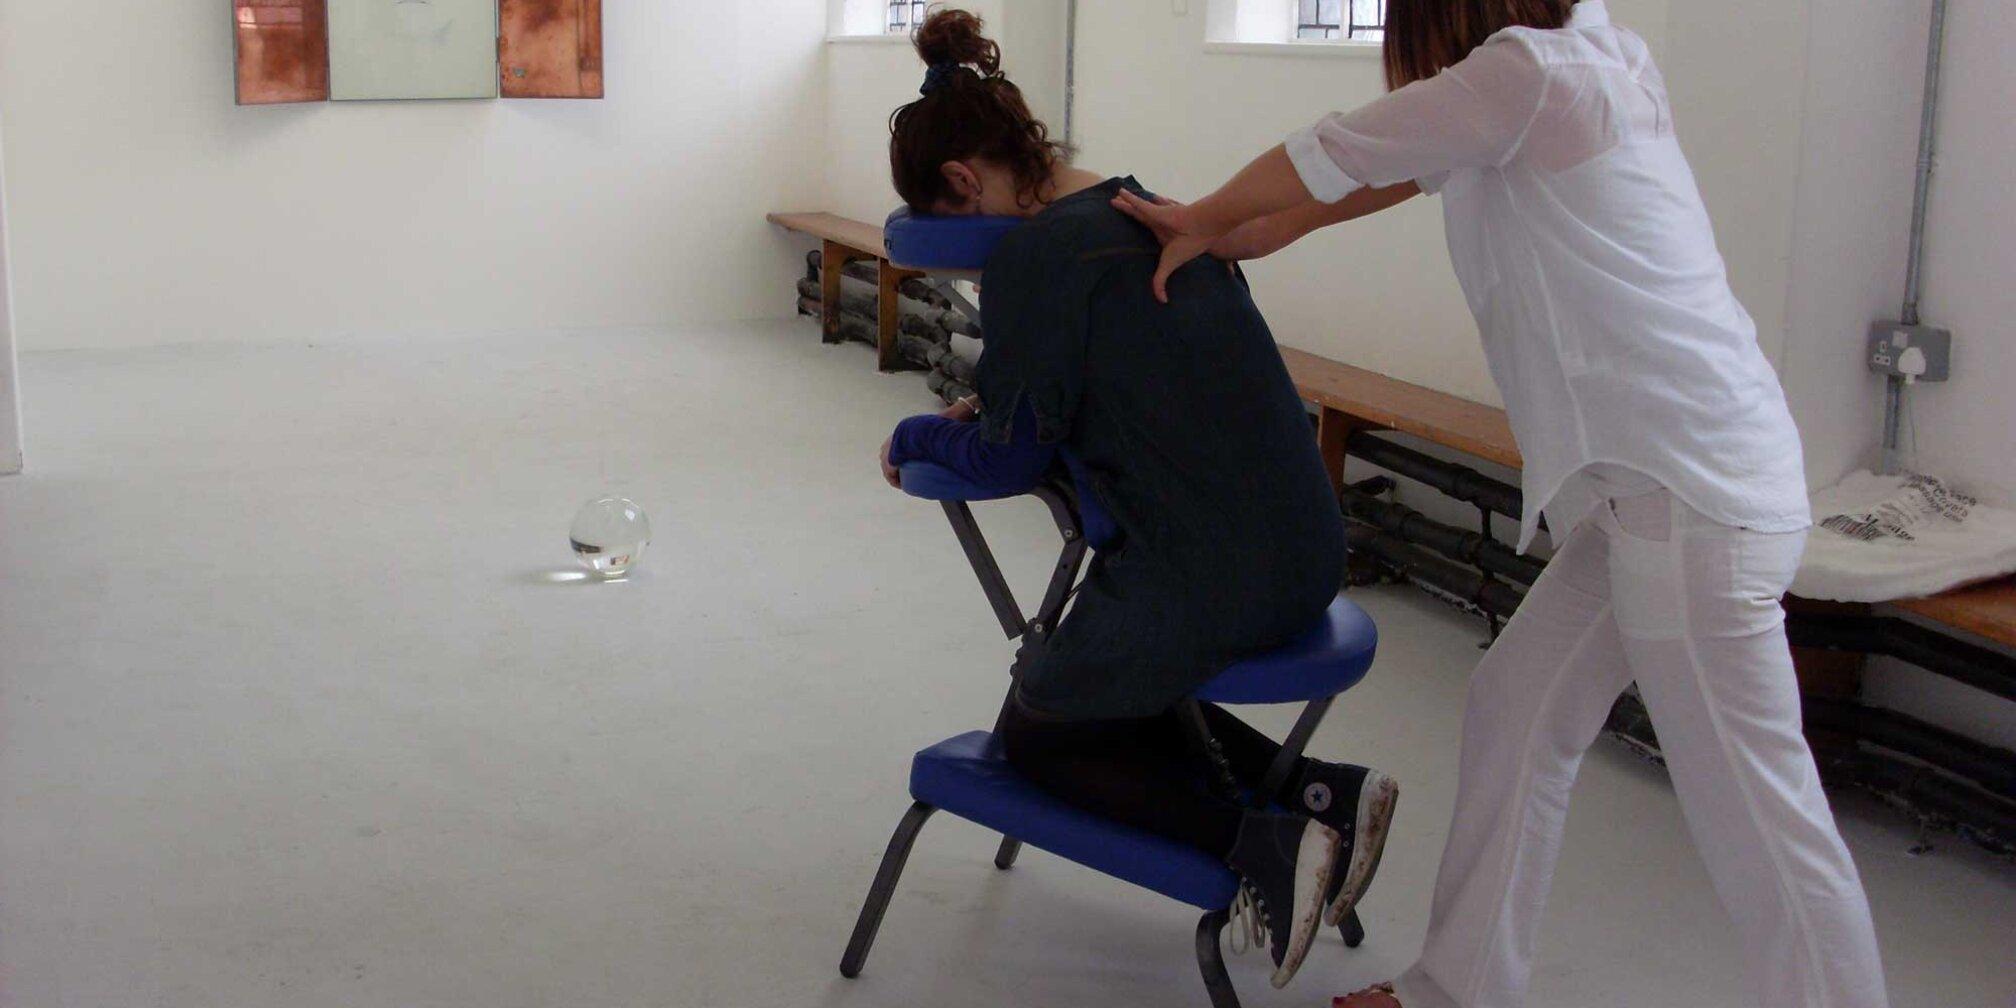 Gabriele Beveridge Invites Presentation, 2014 at Zabludowicz Collection, London